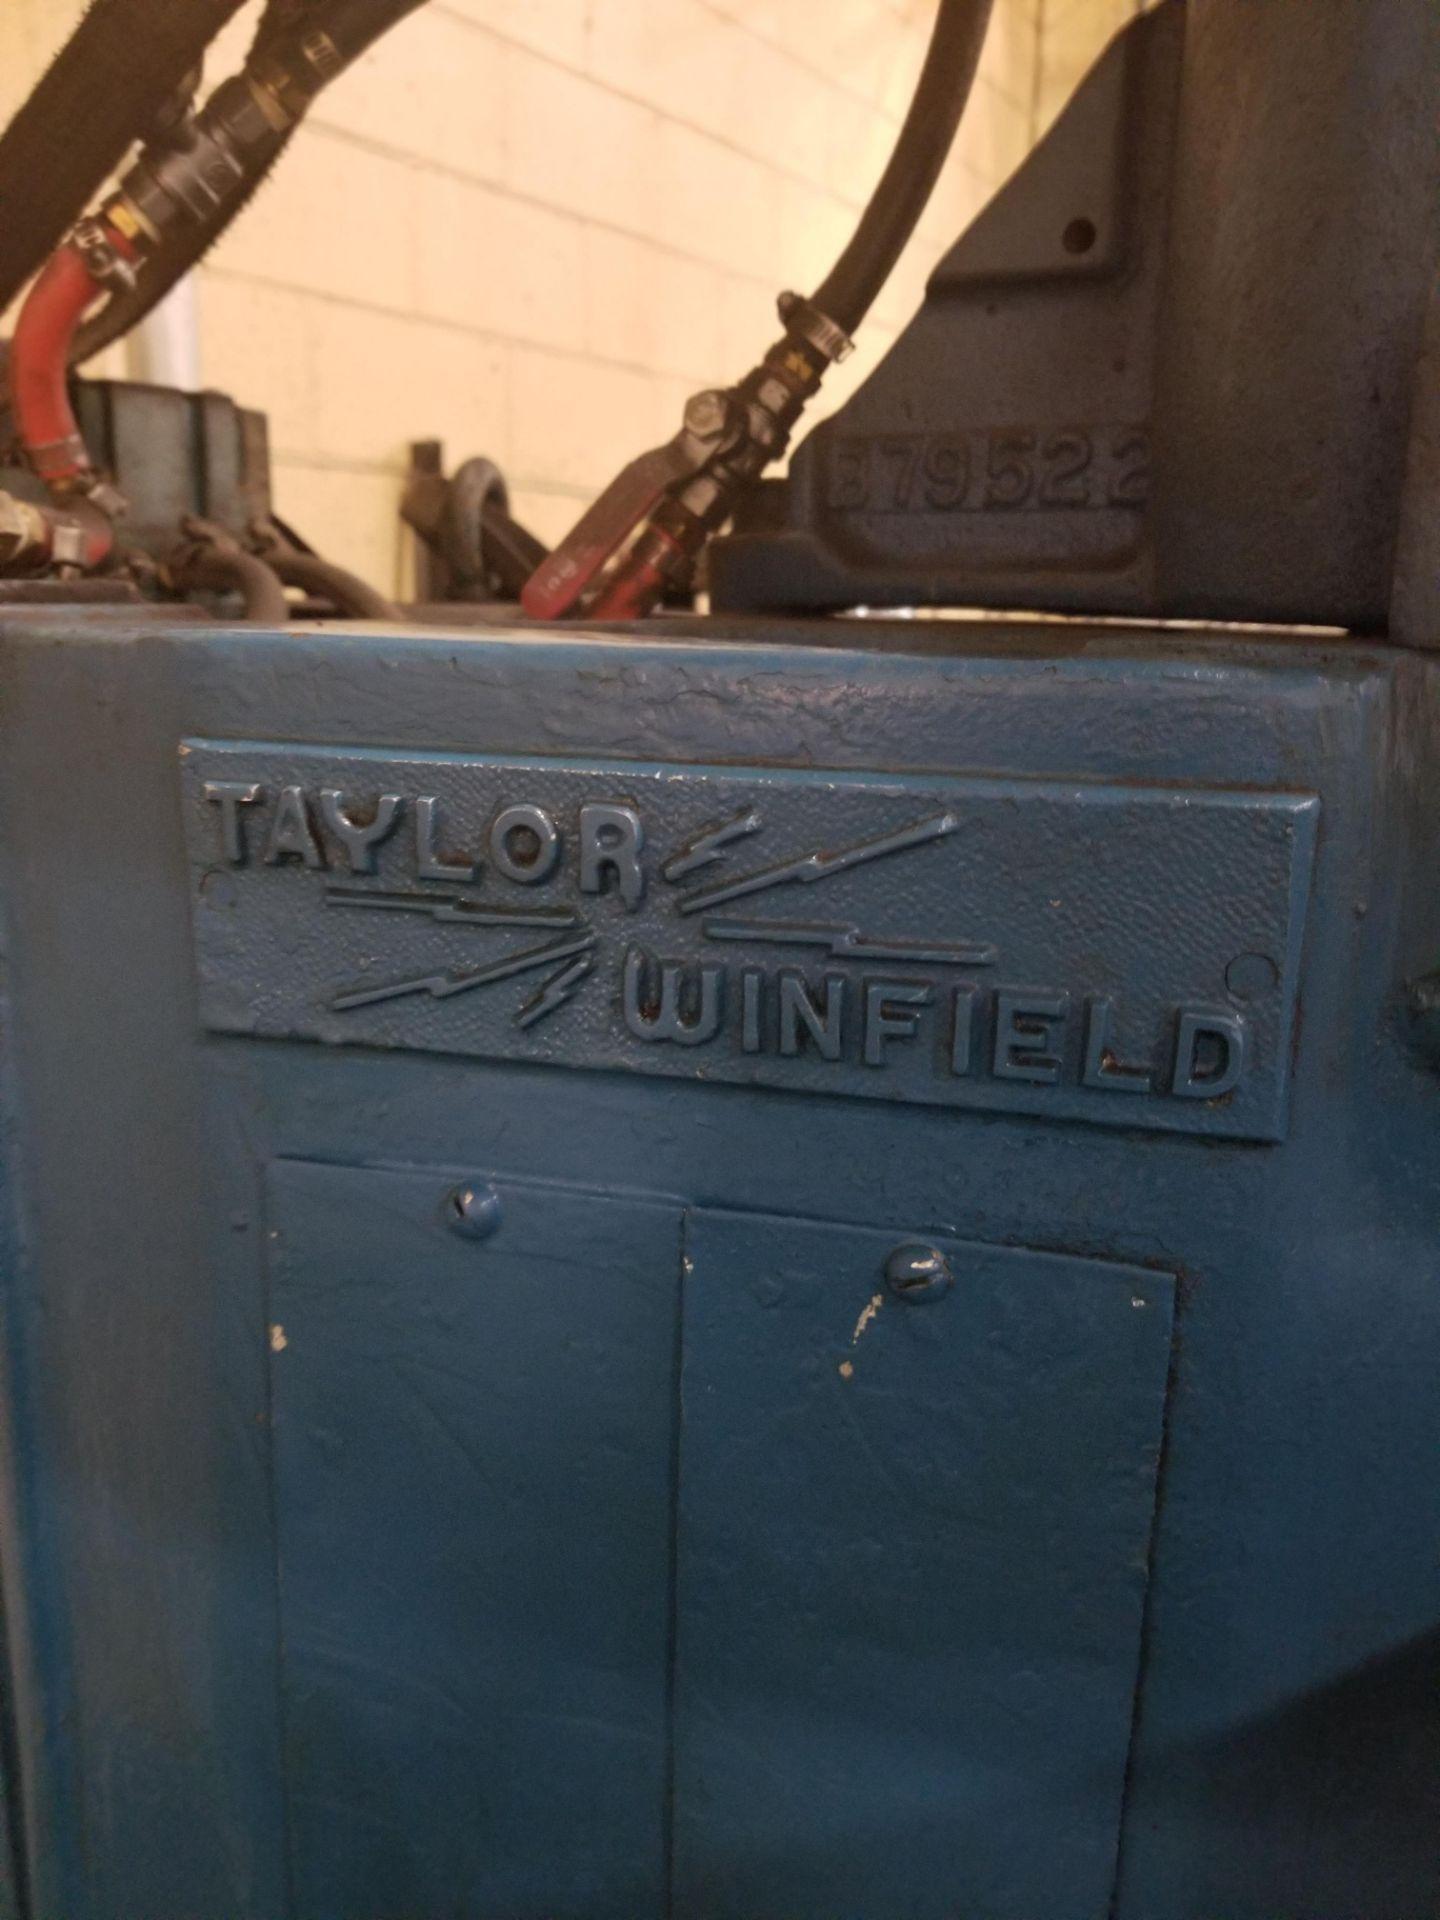 "Taylor Winfield 120 KVA Spot Welder, 18"" Throat - Image 5 of 7"